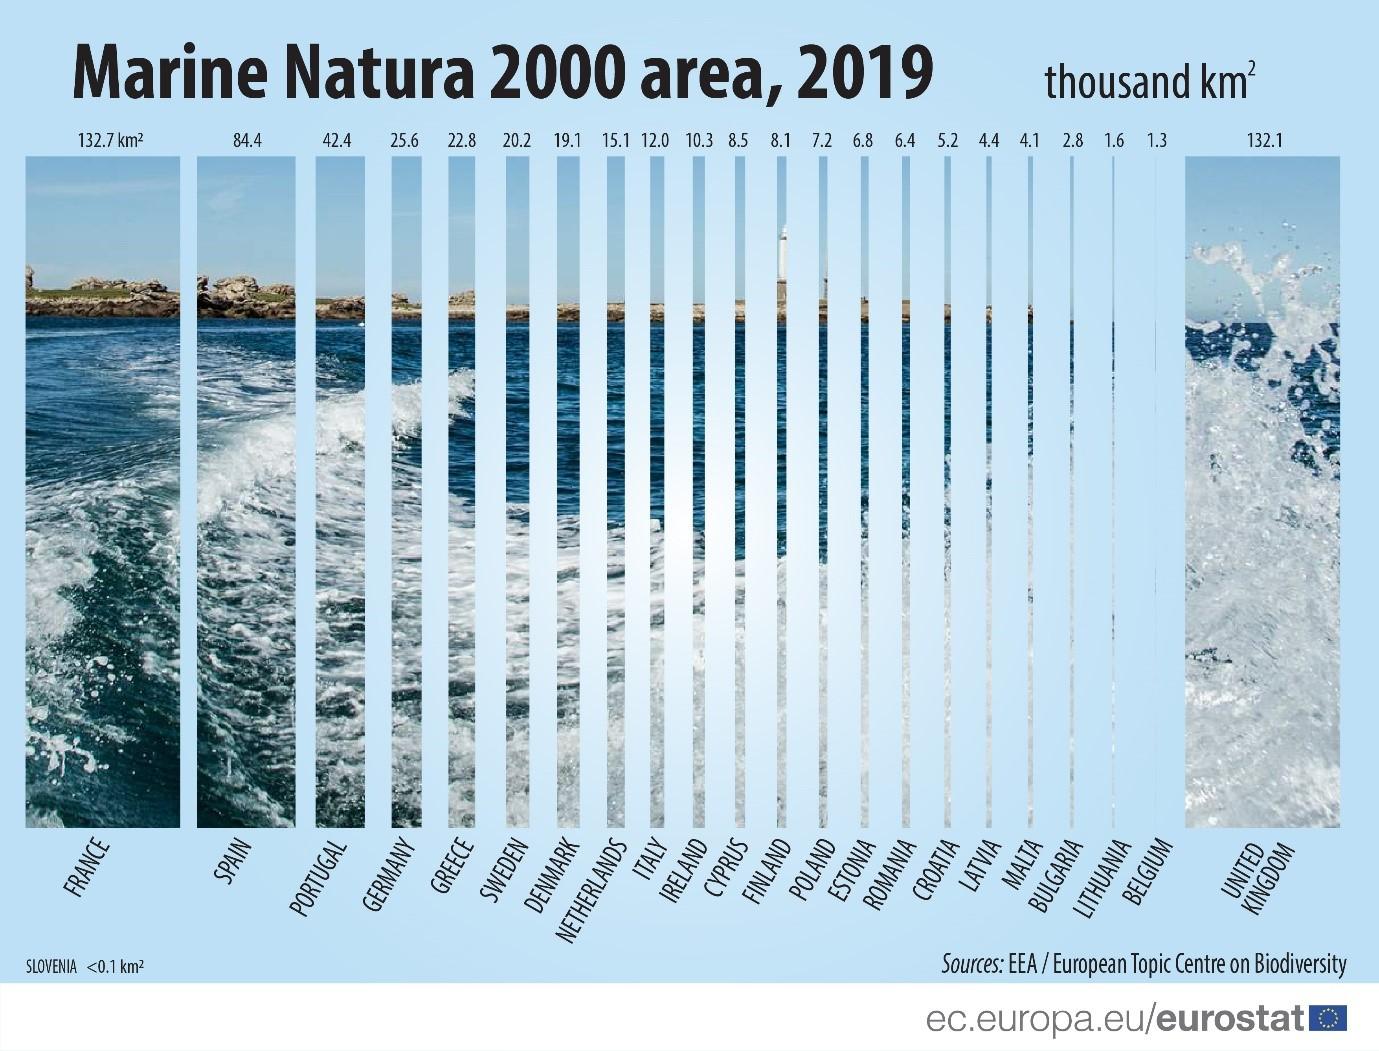 Marine Natura 2000 area, 2019